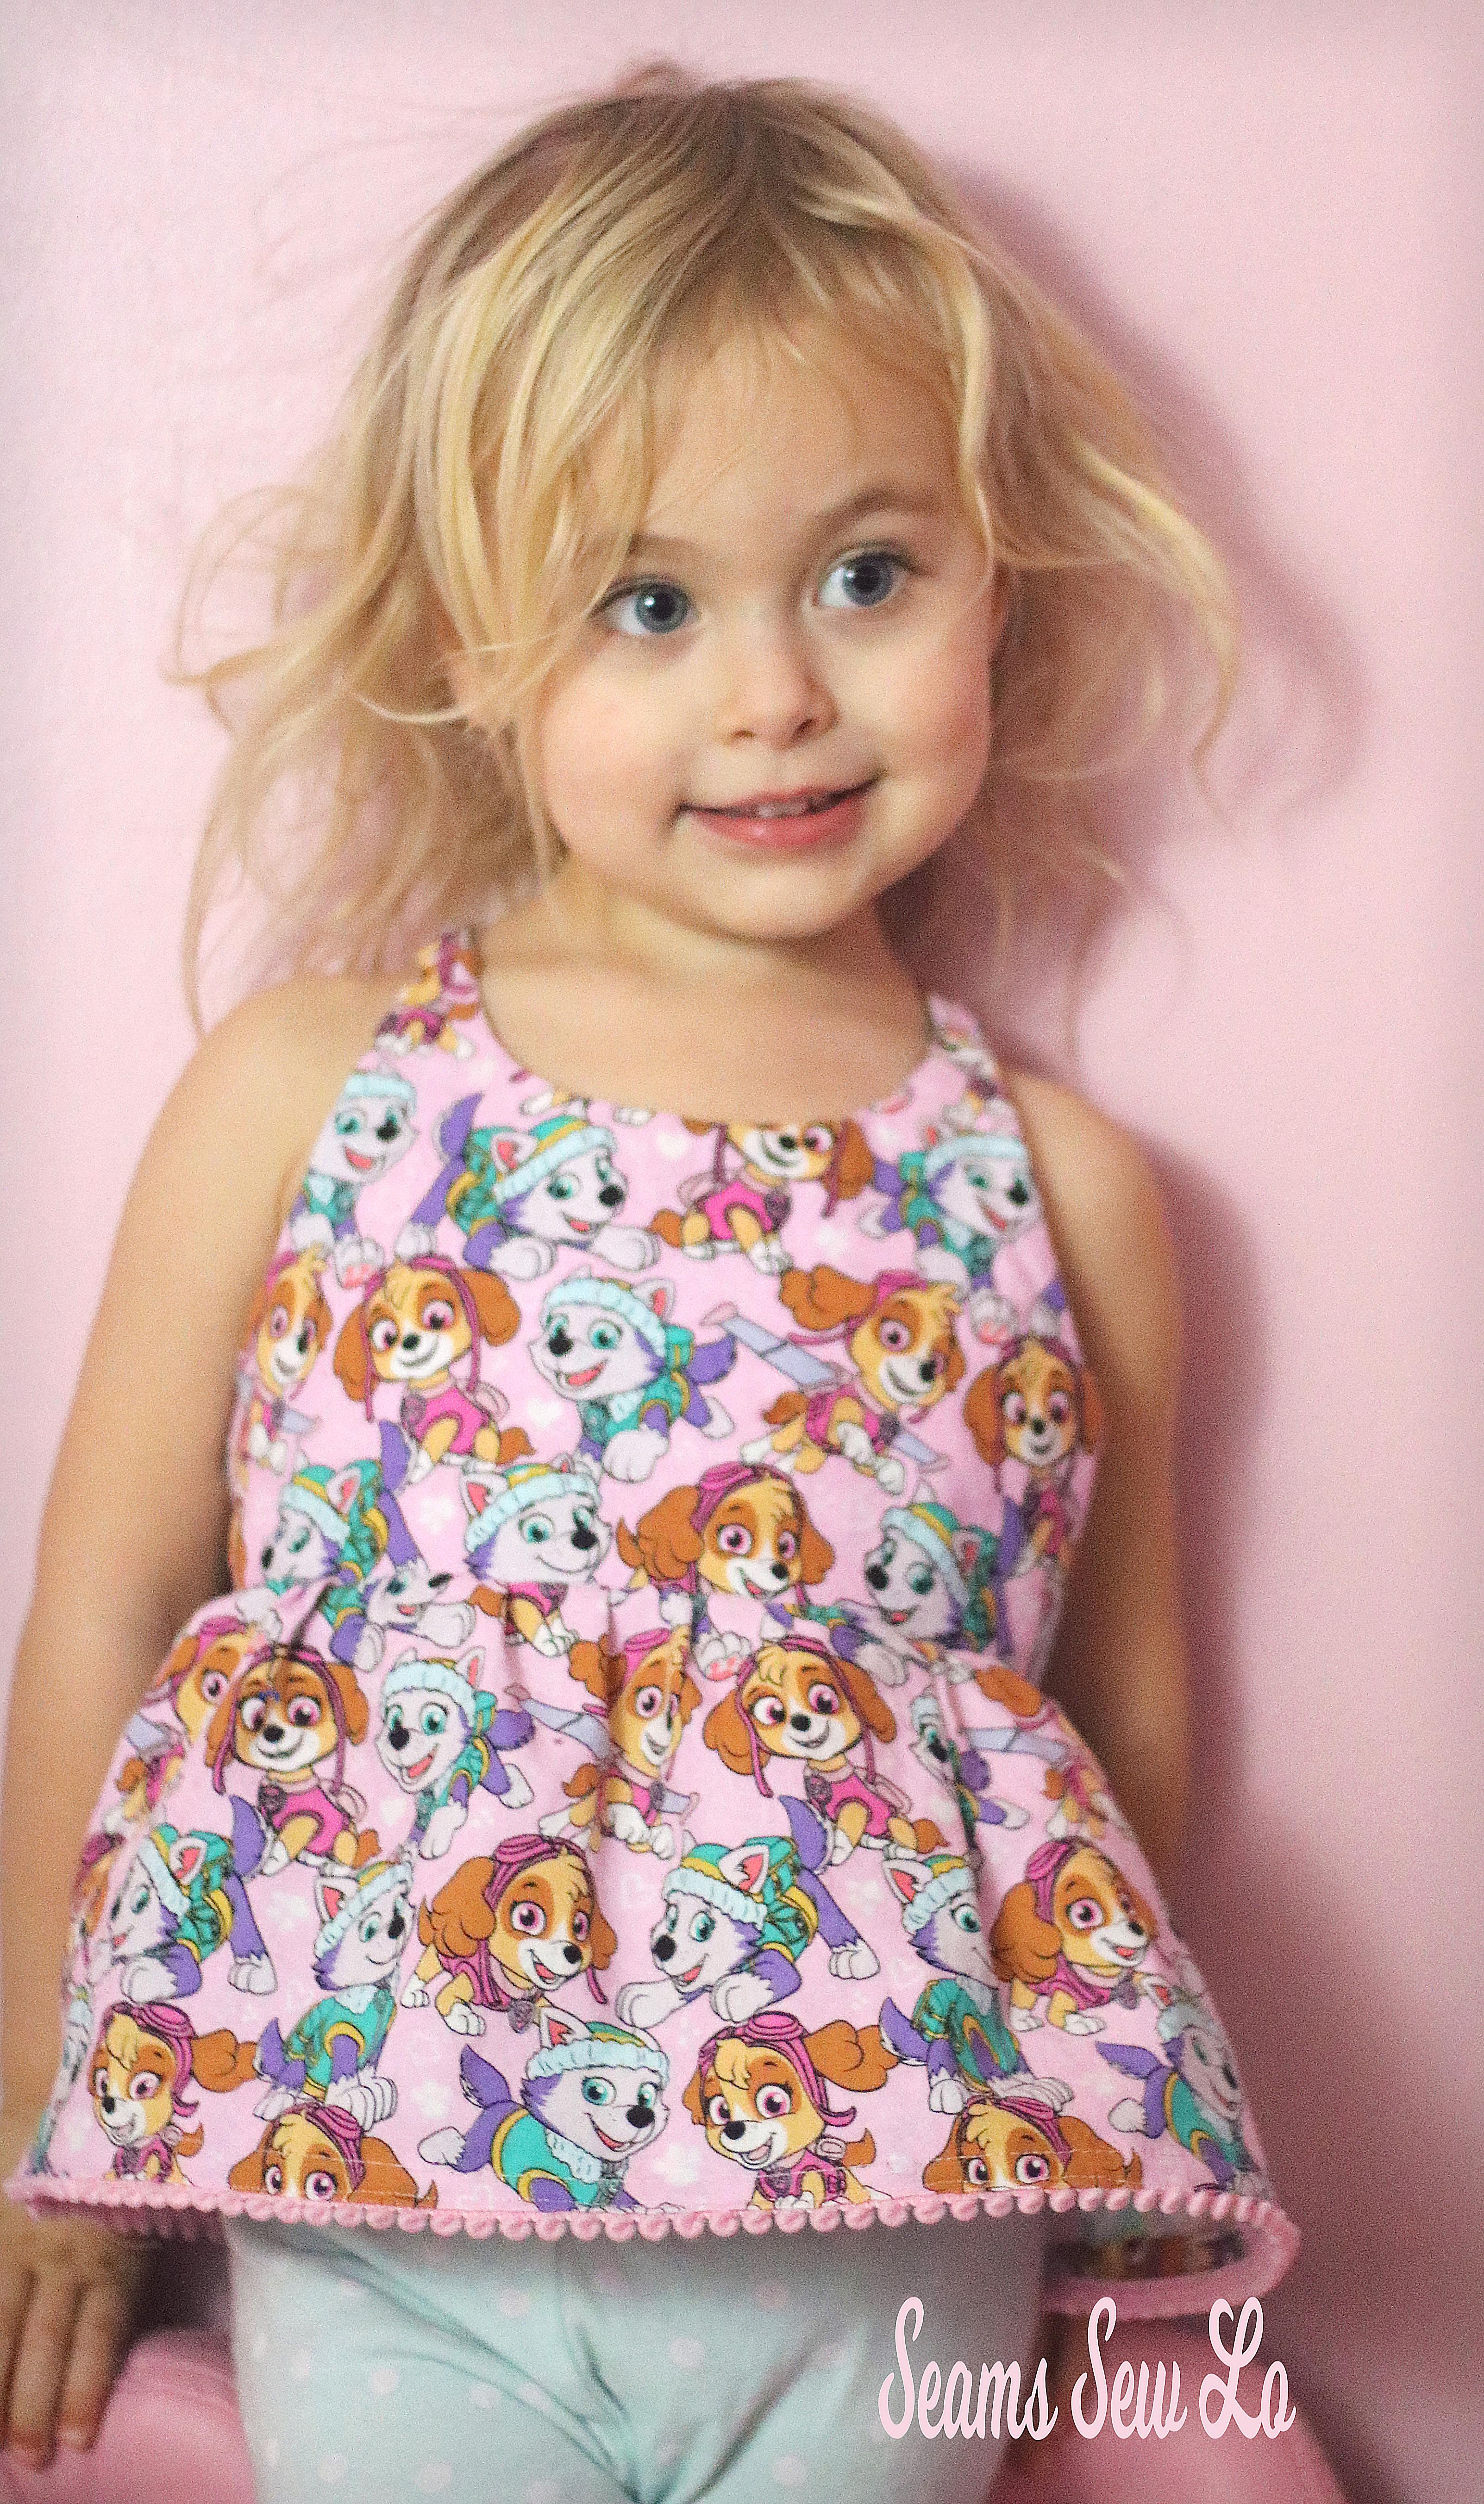 Petite Stitchery Periwinkle girls woven tunic in pink paw patrol Skye and Everest fabric pink pom pom trim